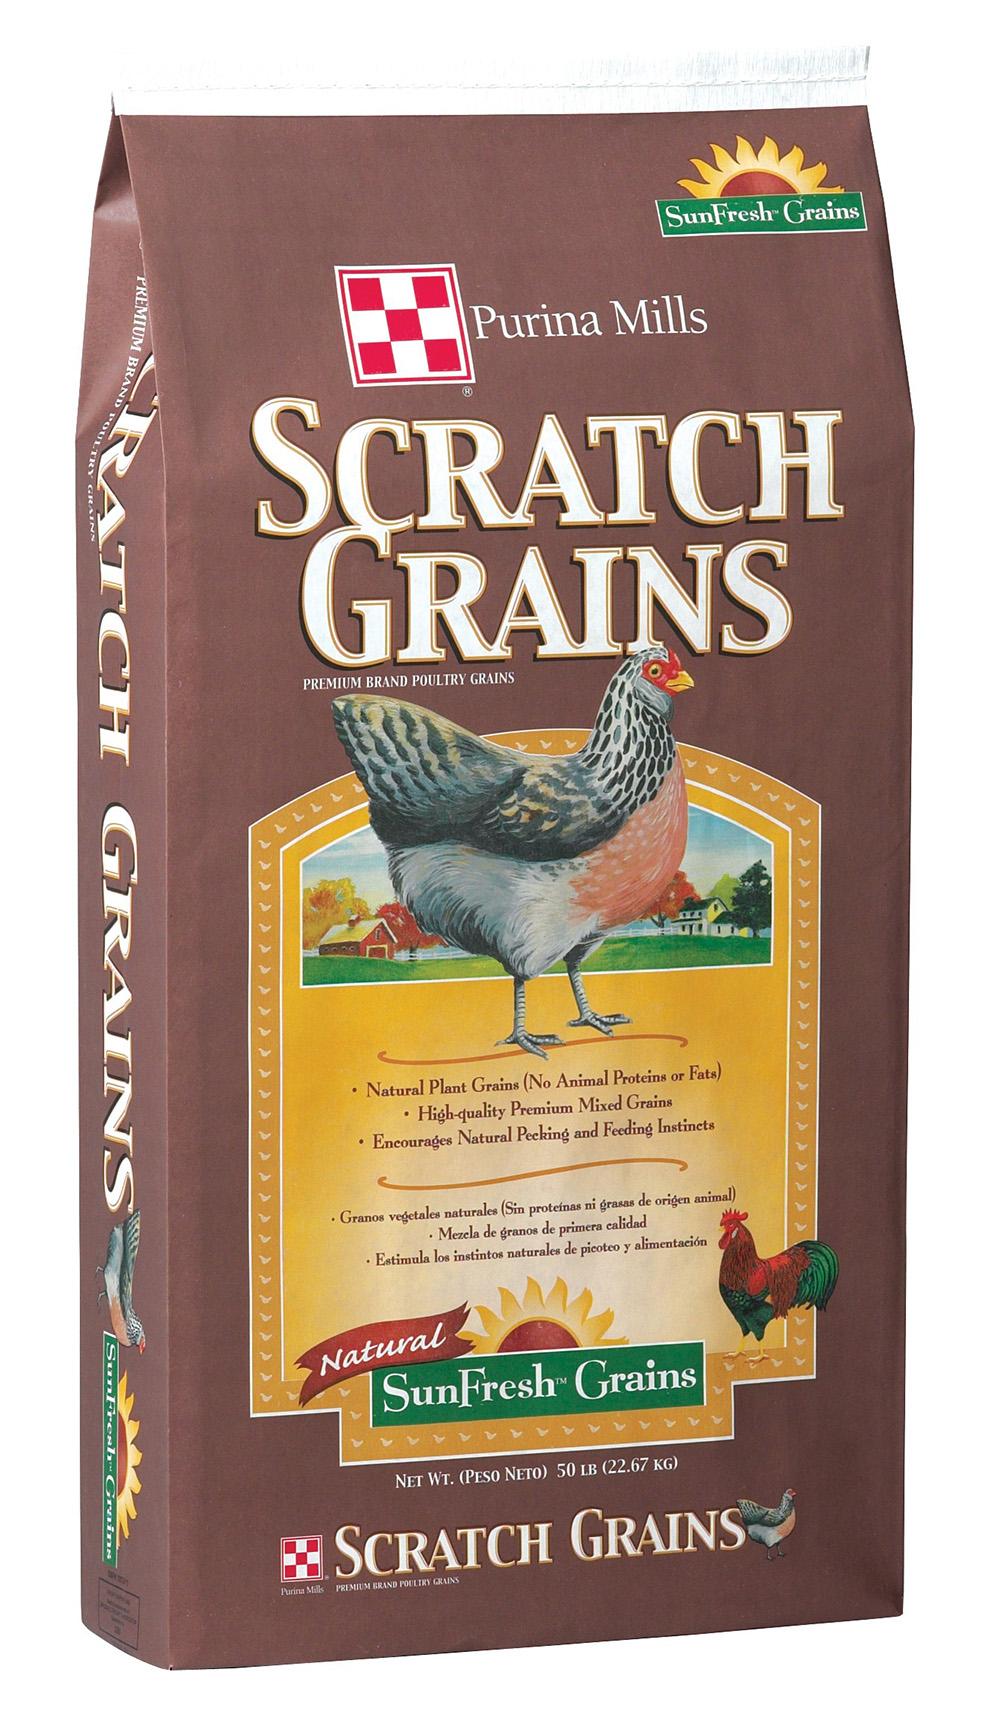 Taste Of The Wild Puppy Food >> Purina Scratch Grains 50 lb.